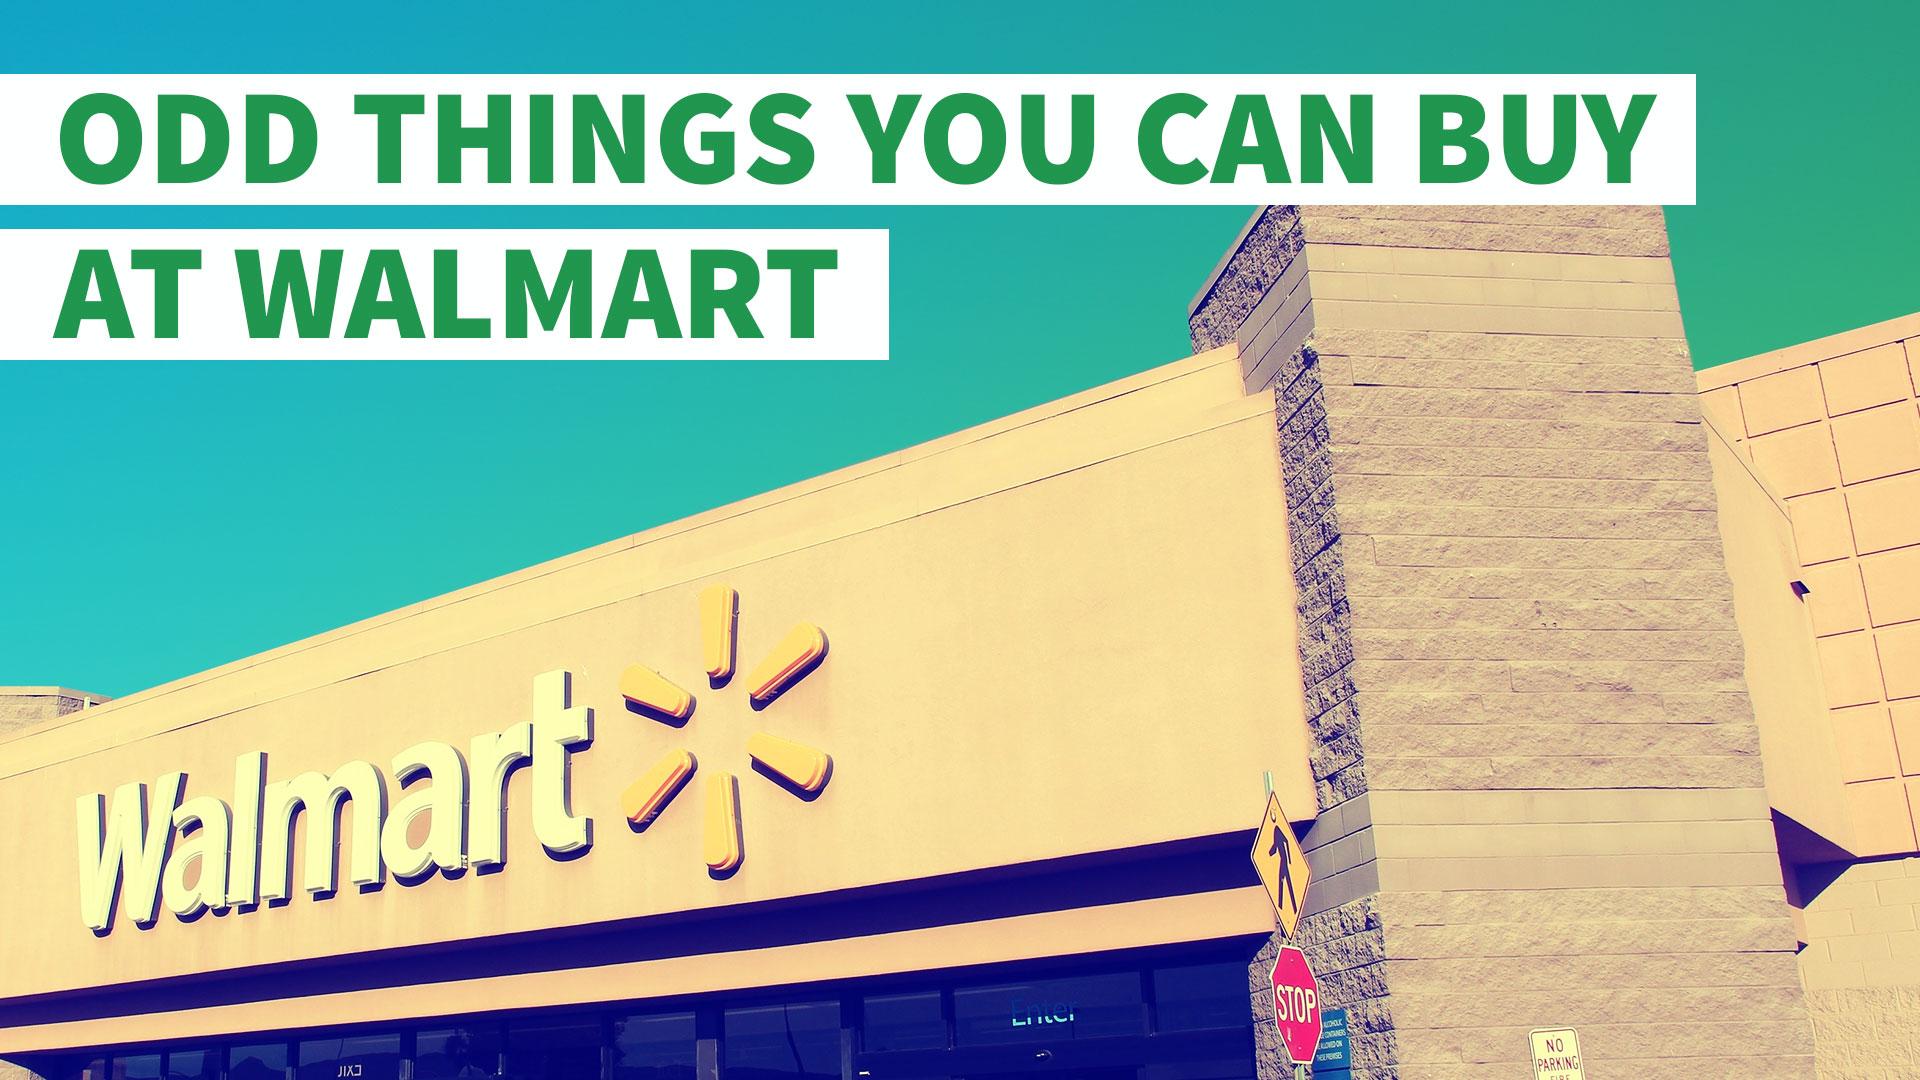 6 Odd Things You Can Buy at Walmart | GOBankingRates